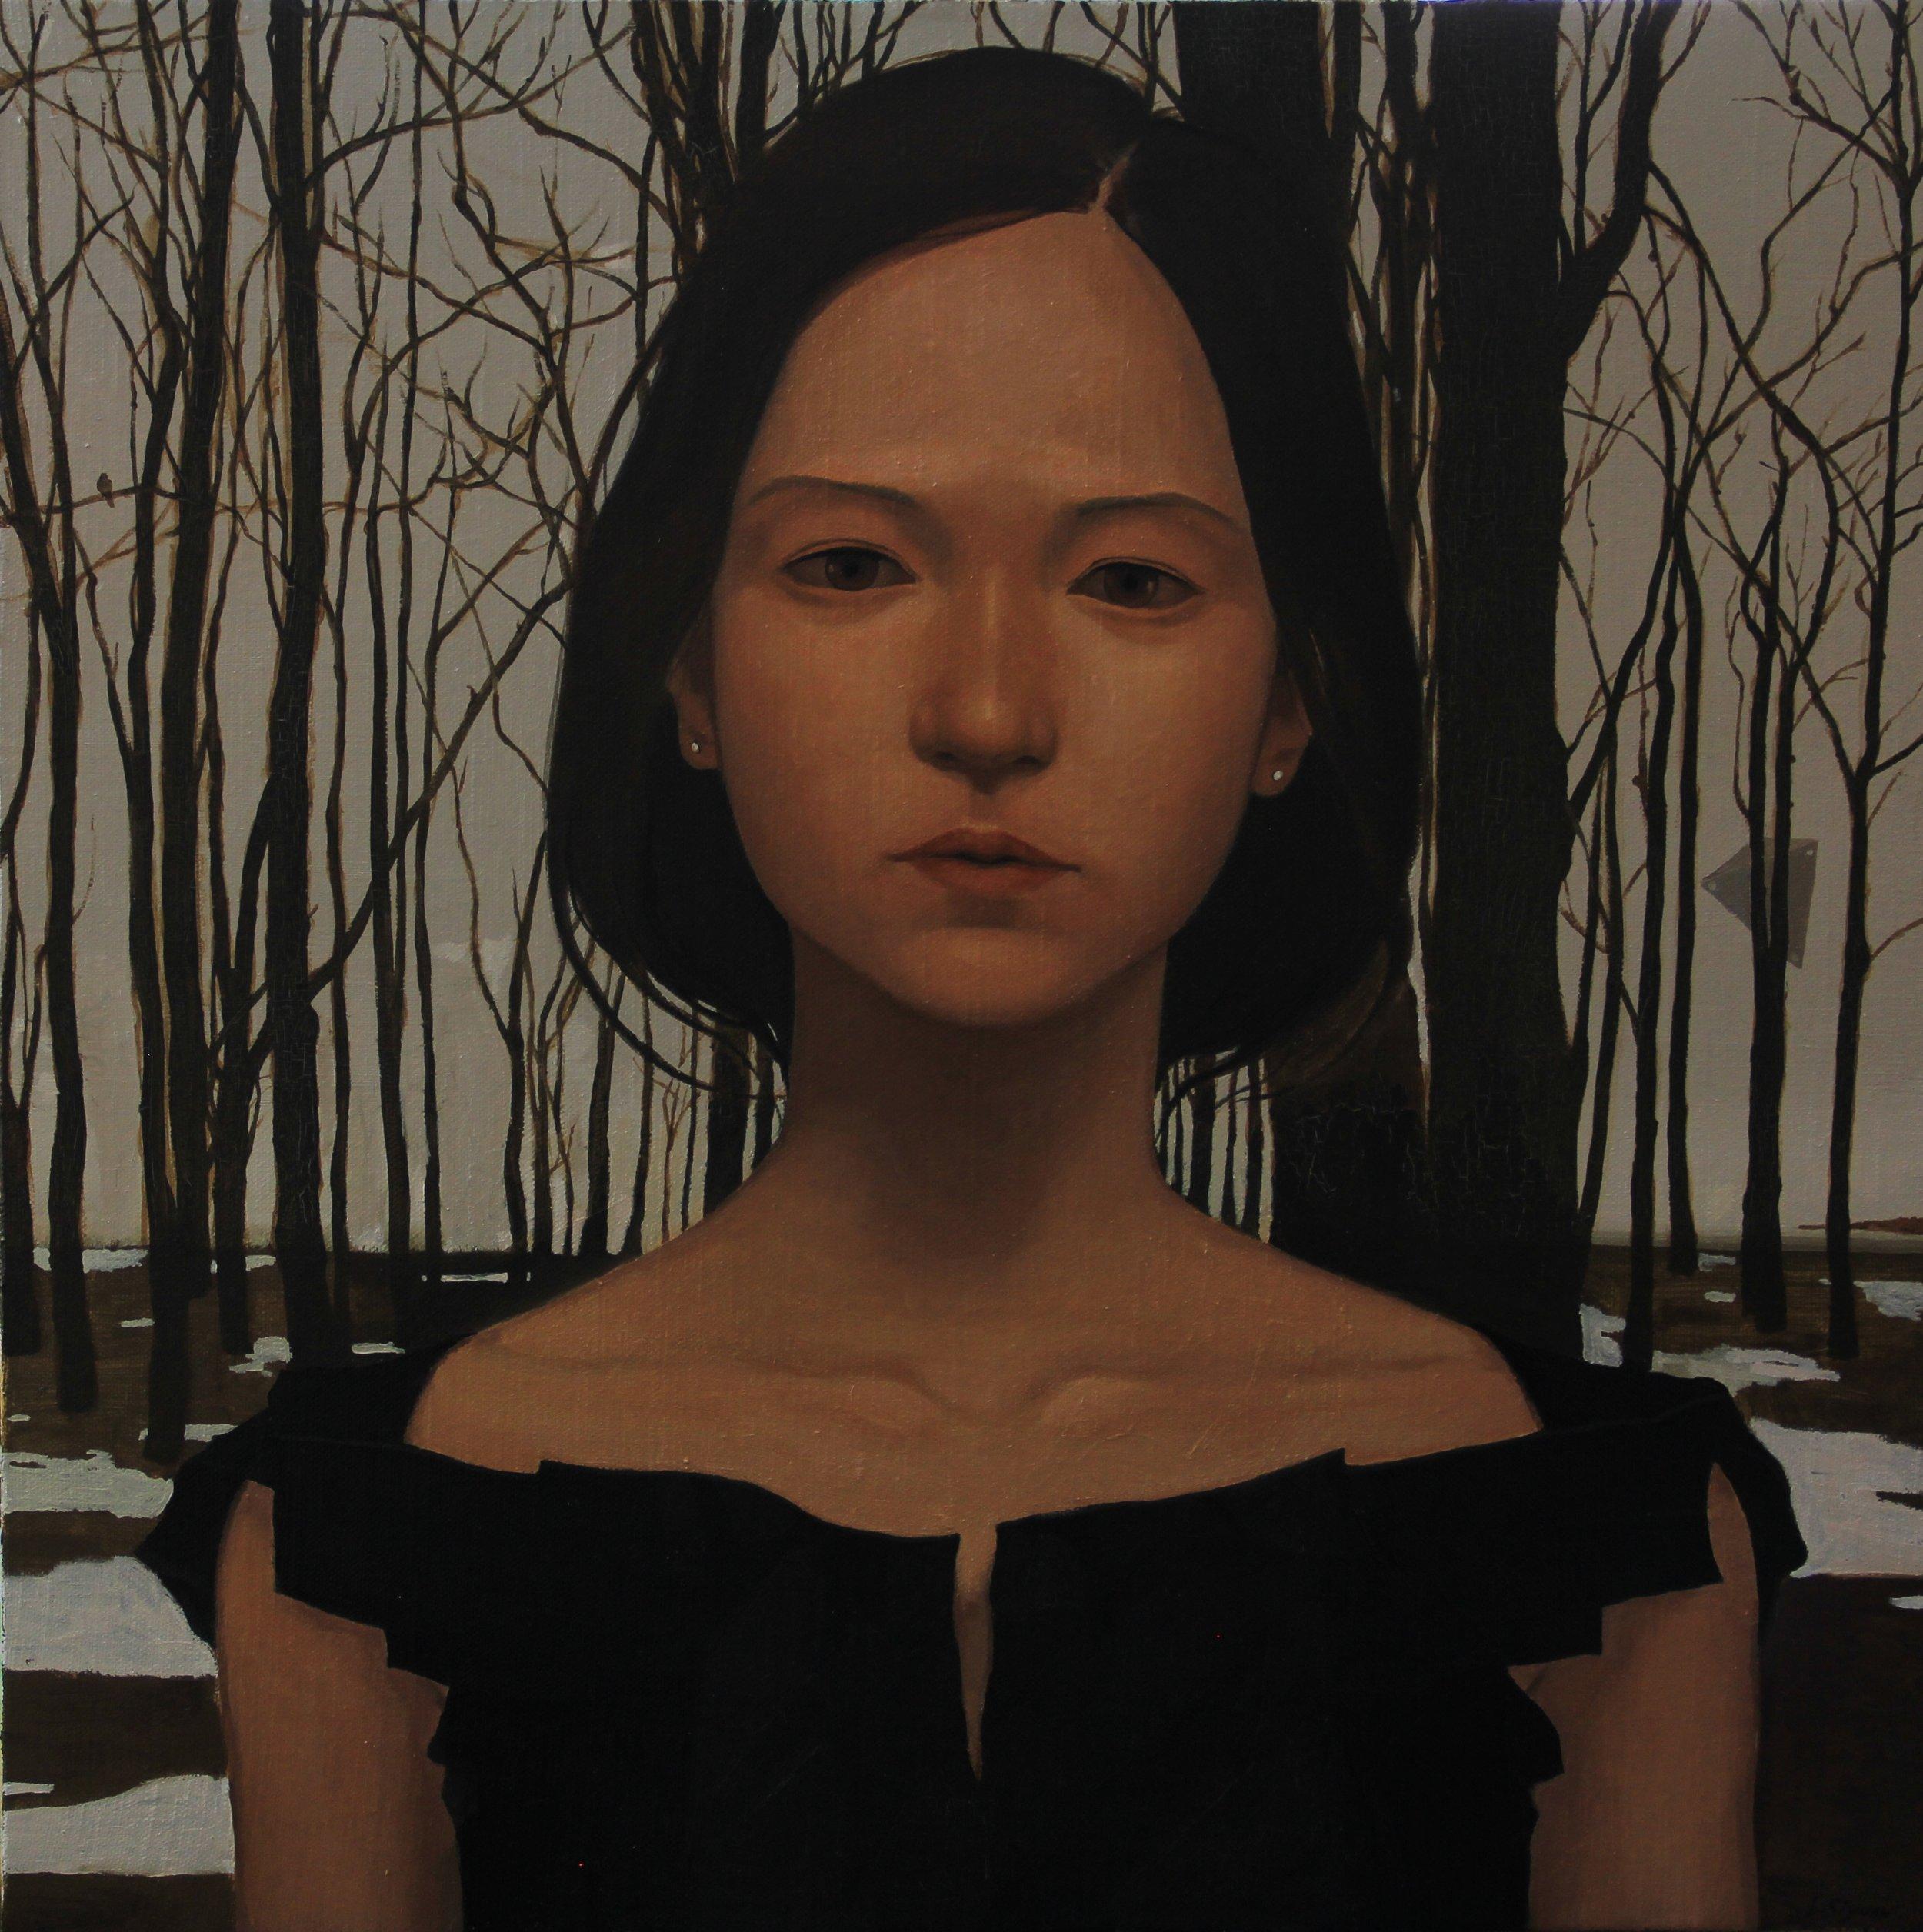 Yanzi,2013, 60cm  x 60cm, Oil on canvas.jpg